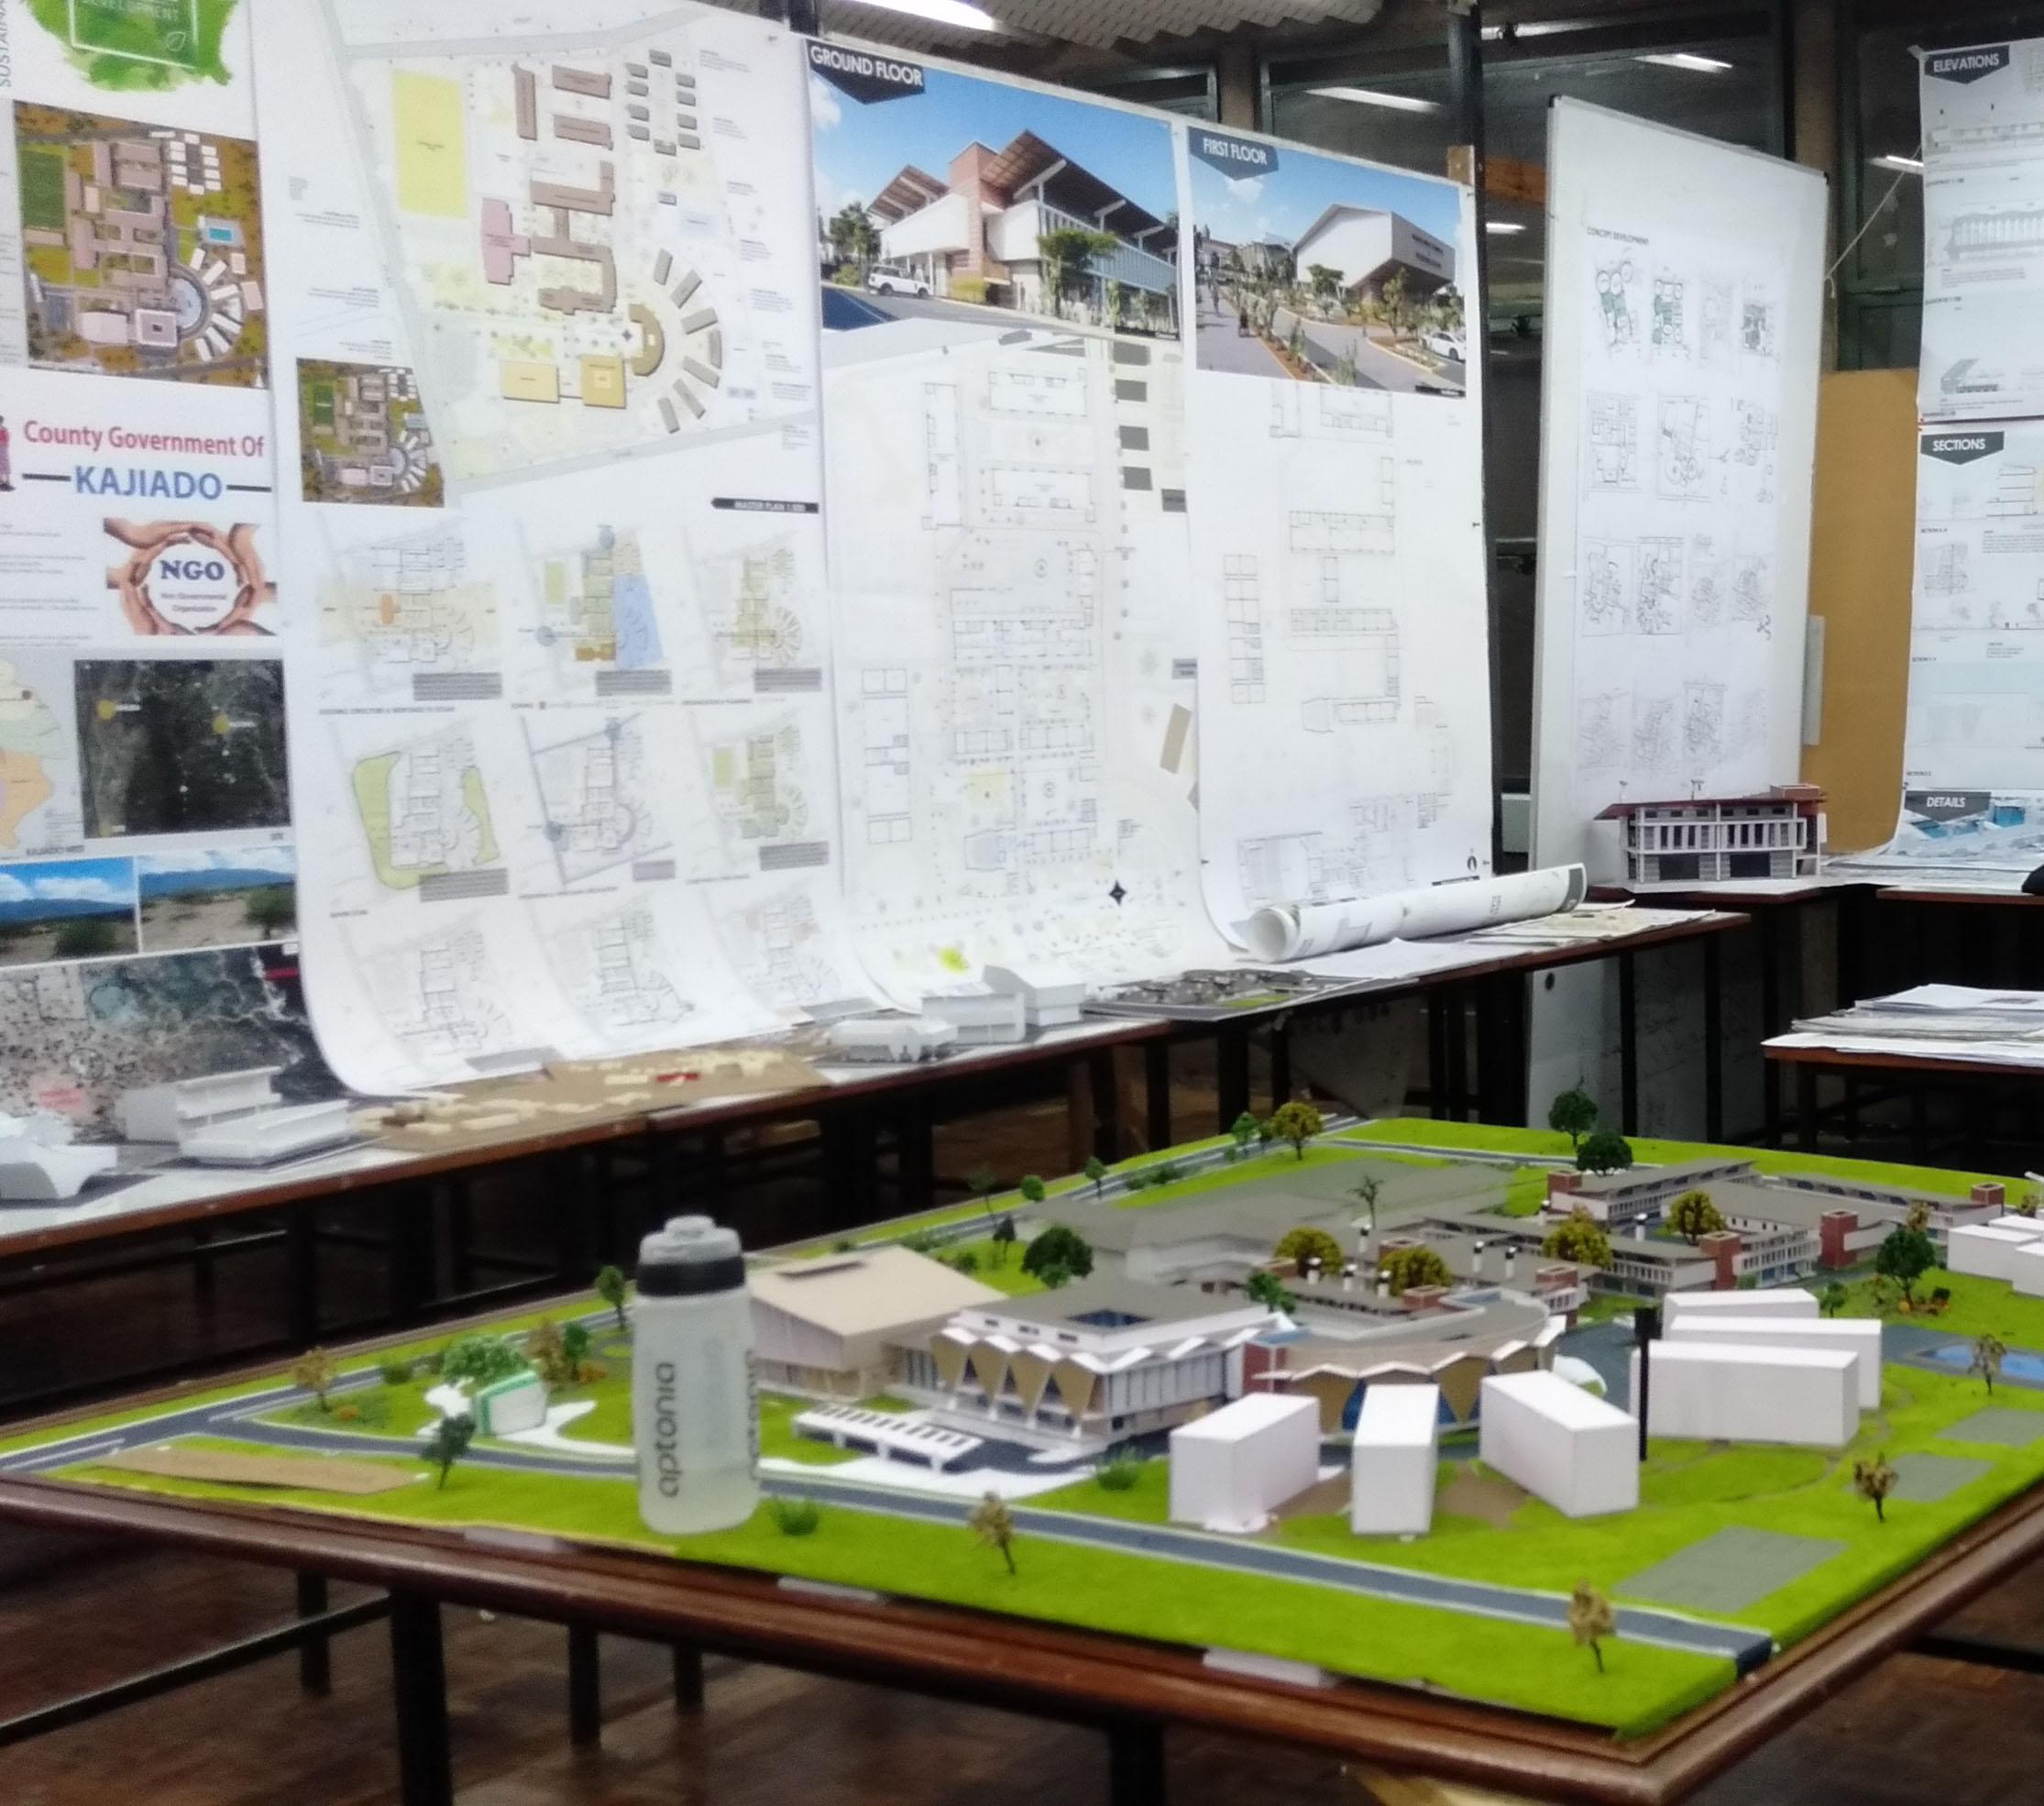 University of Nairobi Exhibition Saita Saitabau Aden Kumary Carbnstudio Architecture Nairobi CAA accreditation.jpg